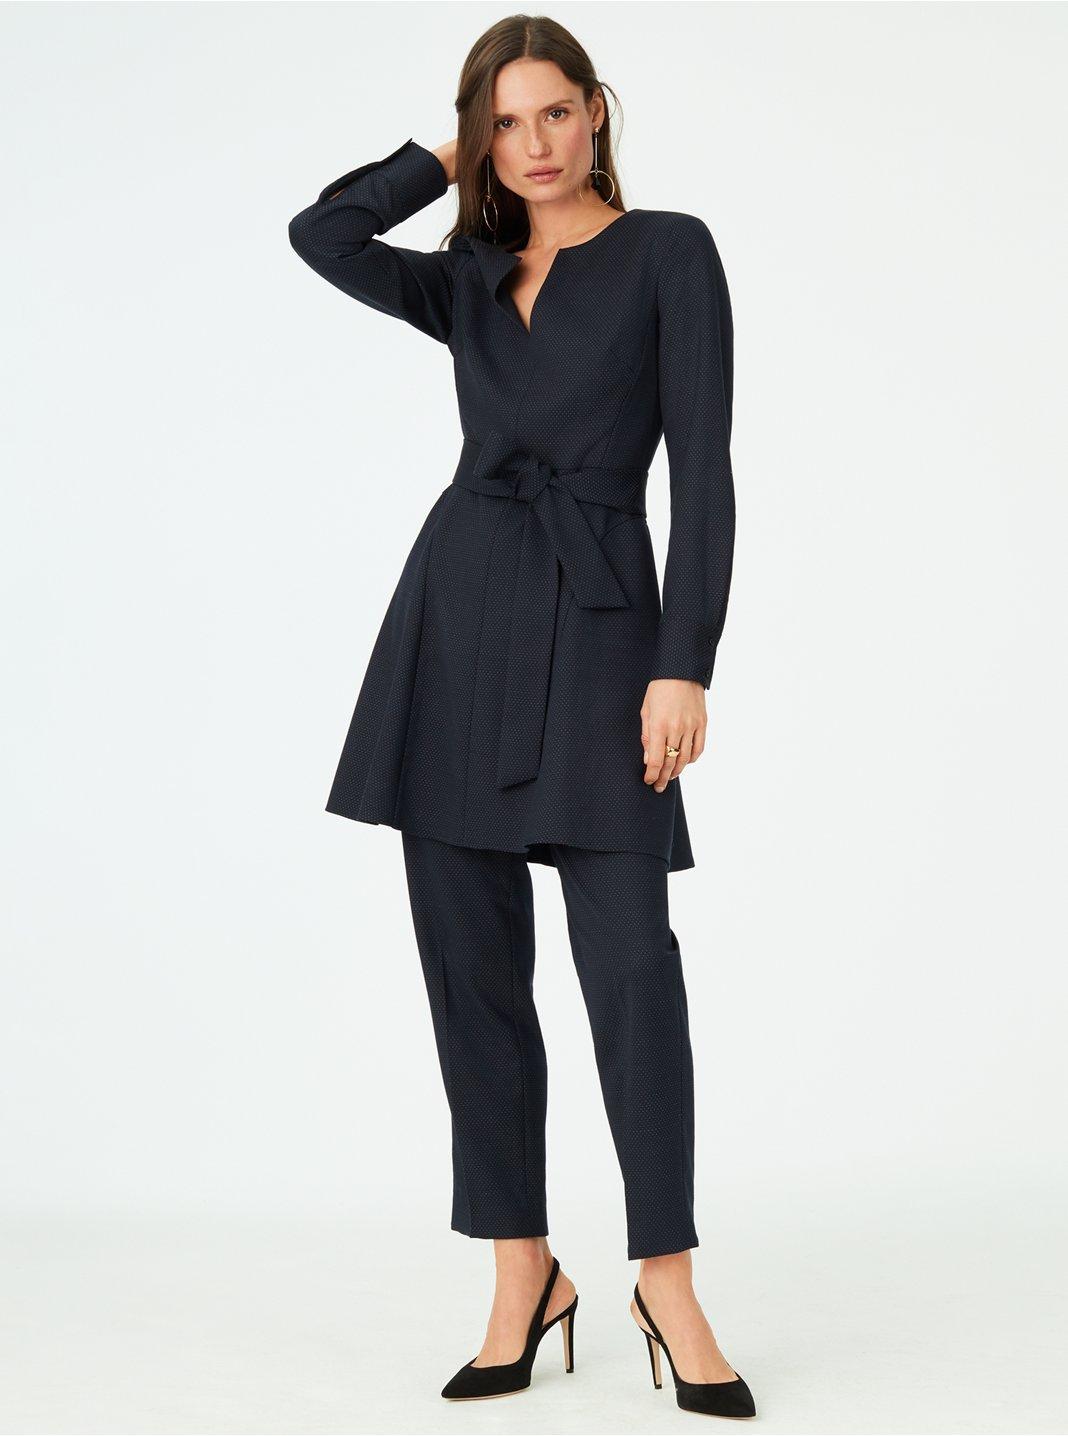 Kasca Pin-Dot Dress